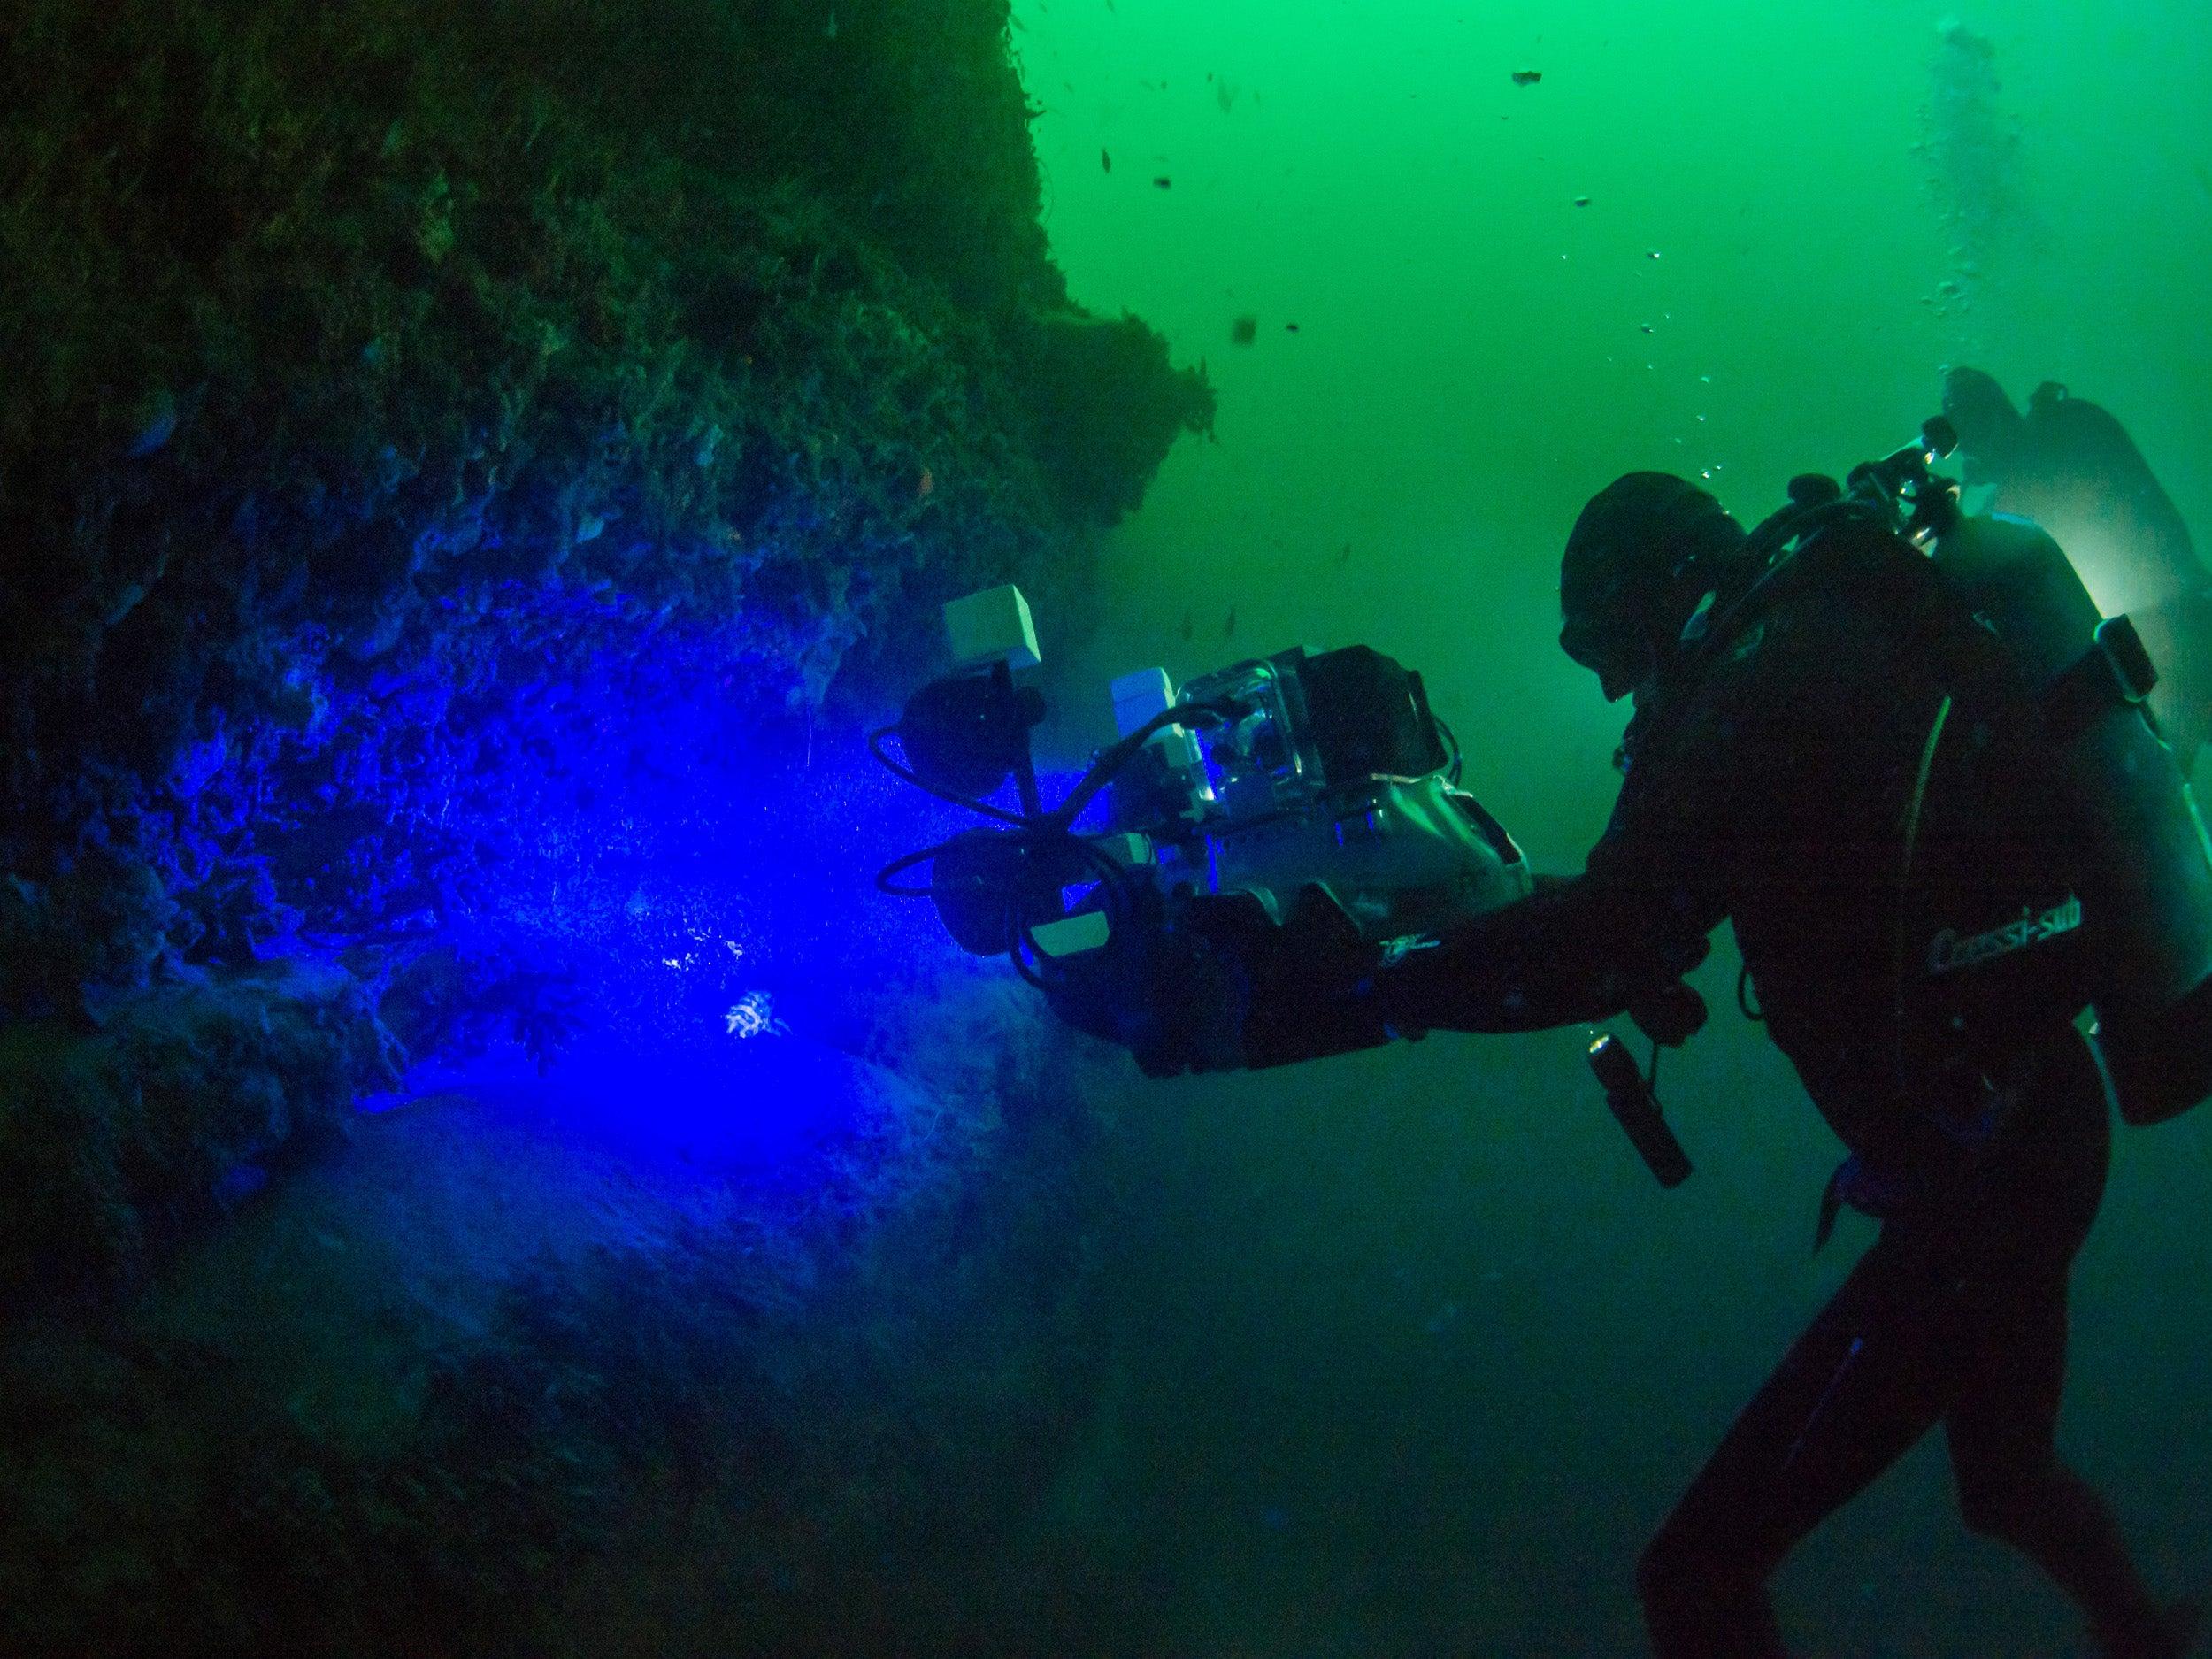 David Gruber films bioflourescence underwater.